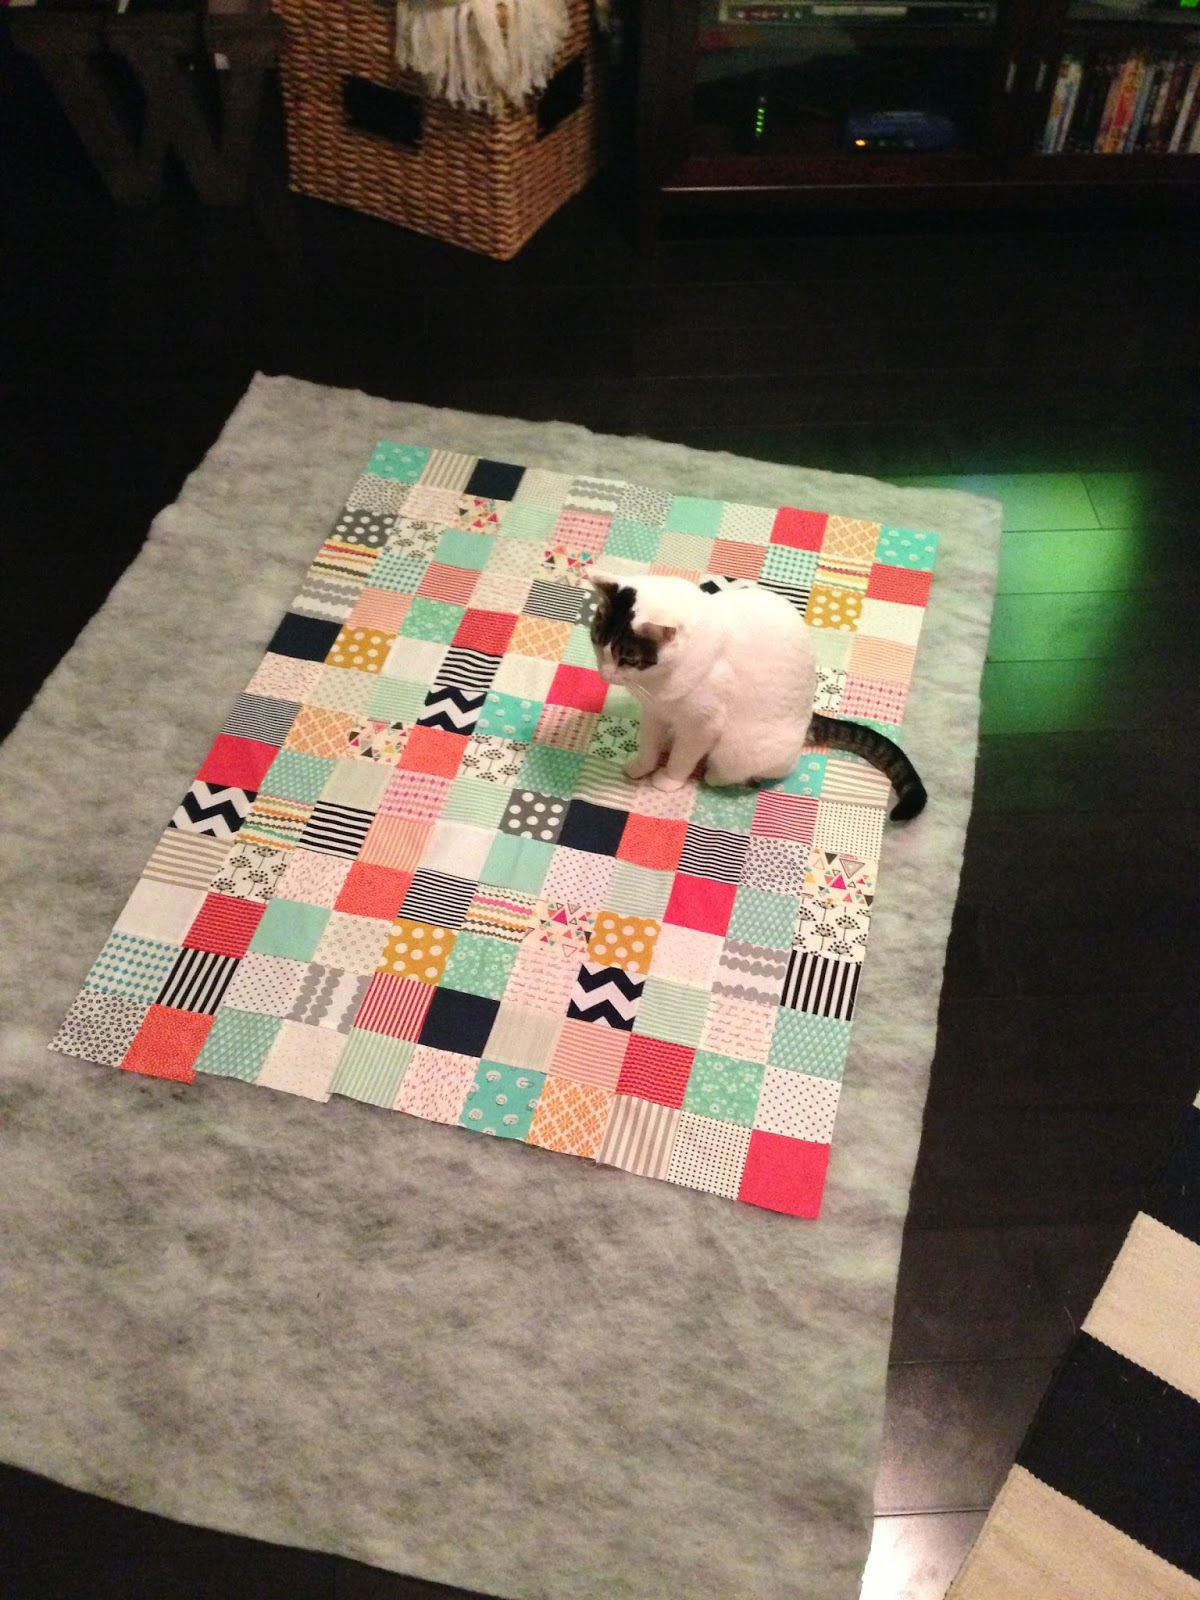 Muffins + Marathons: My quilt for Baby Girl : baby floor quilt - Adamdwight.com